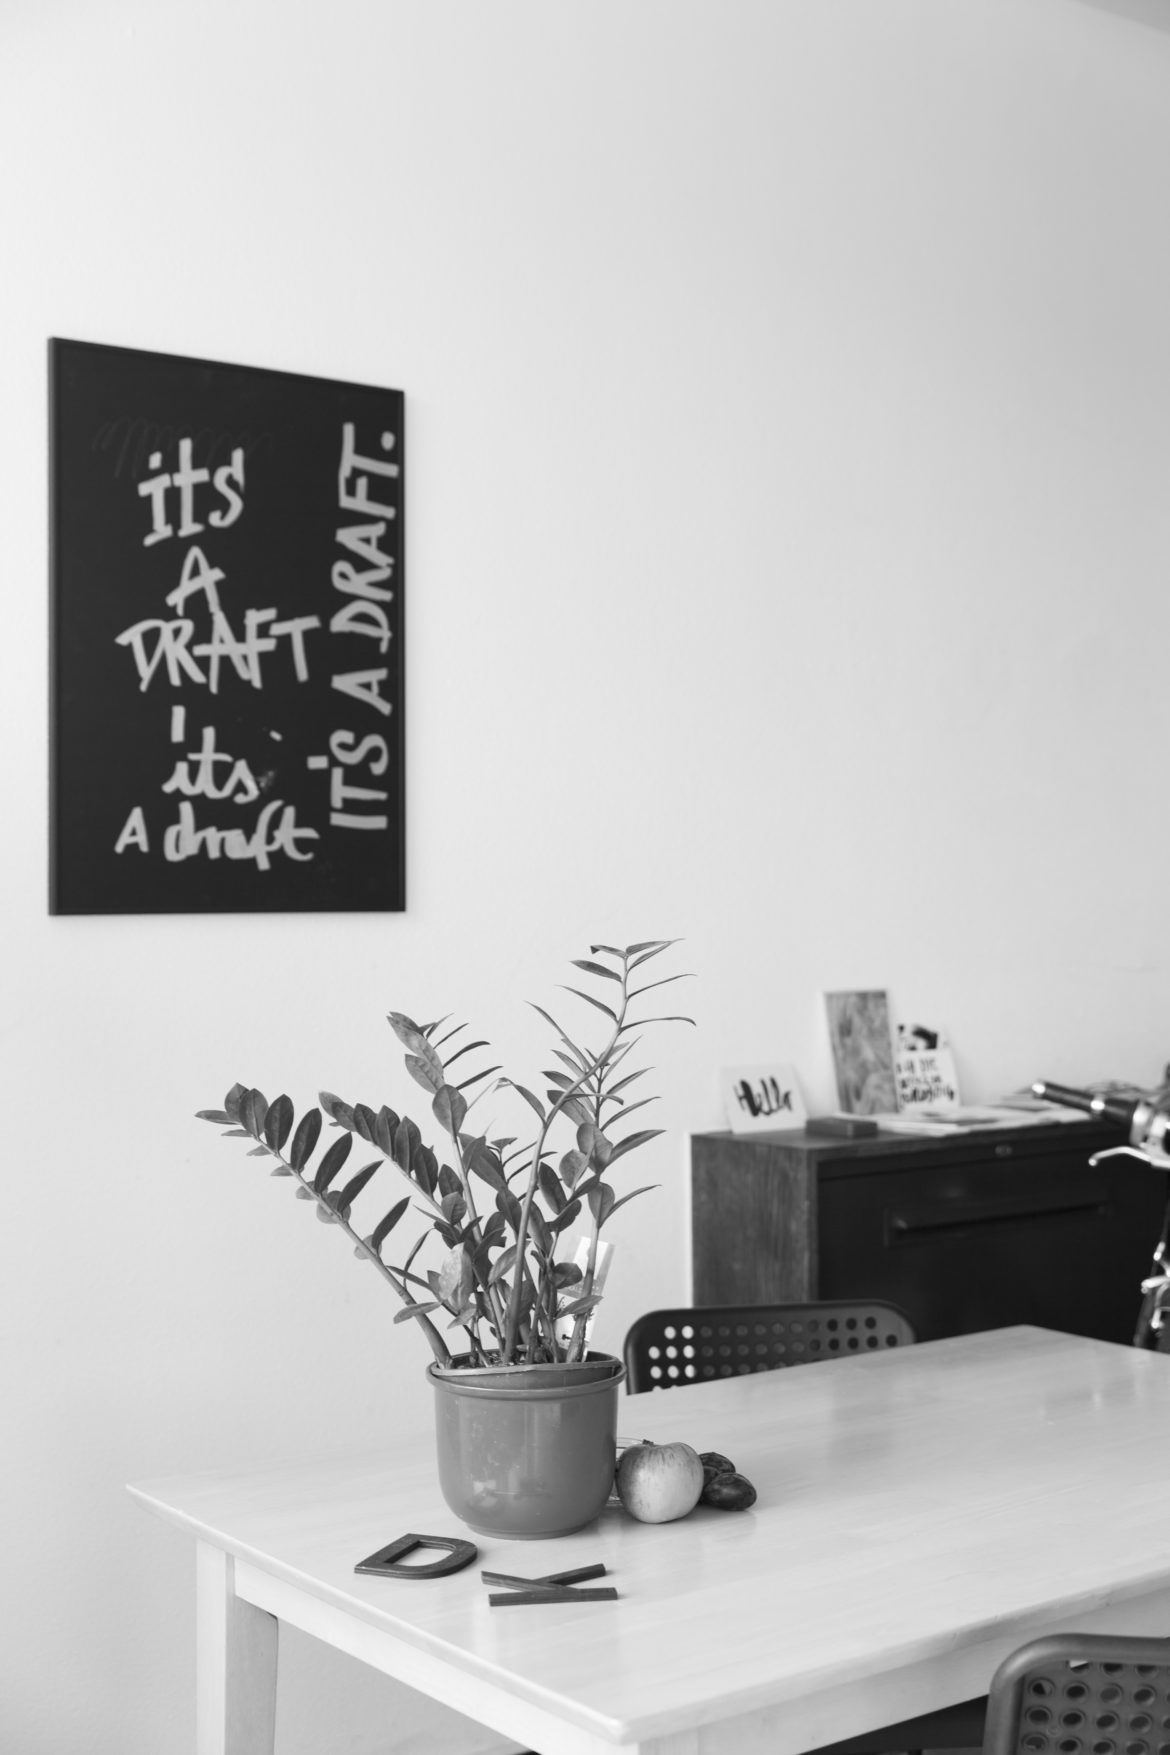 It's a draft, It's a draft, It's a draft | Büro Freiheit | 2018